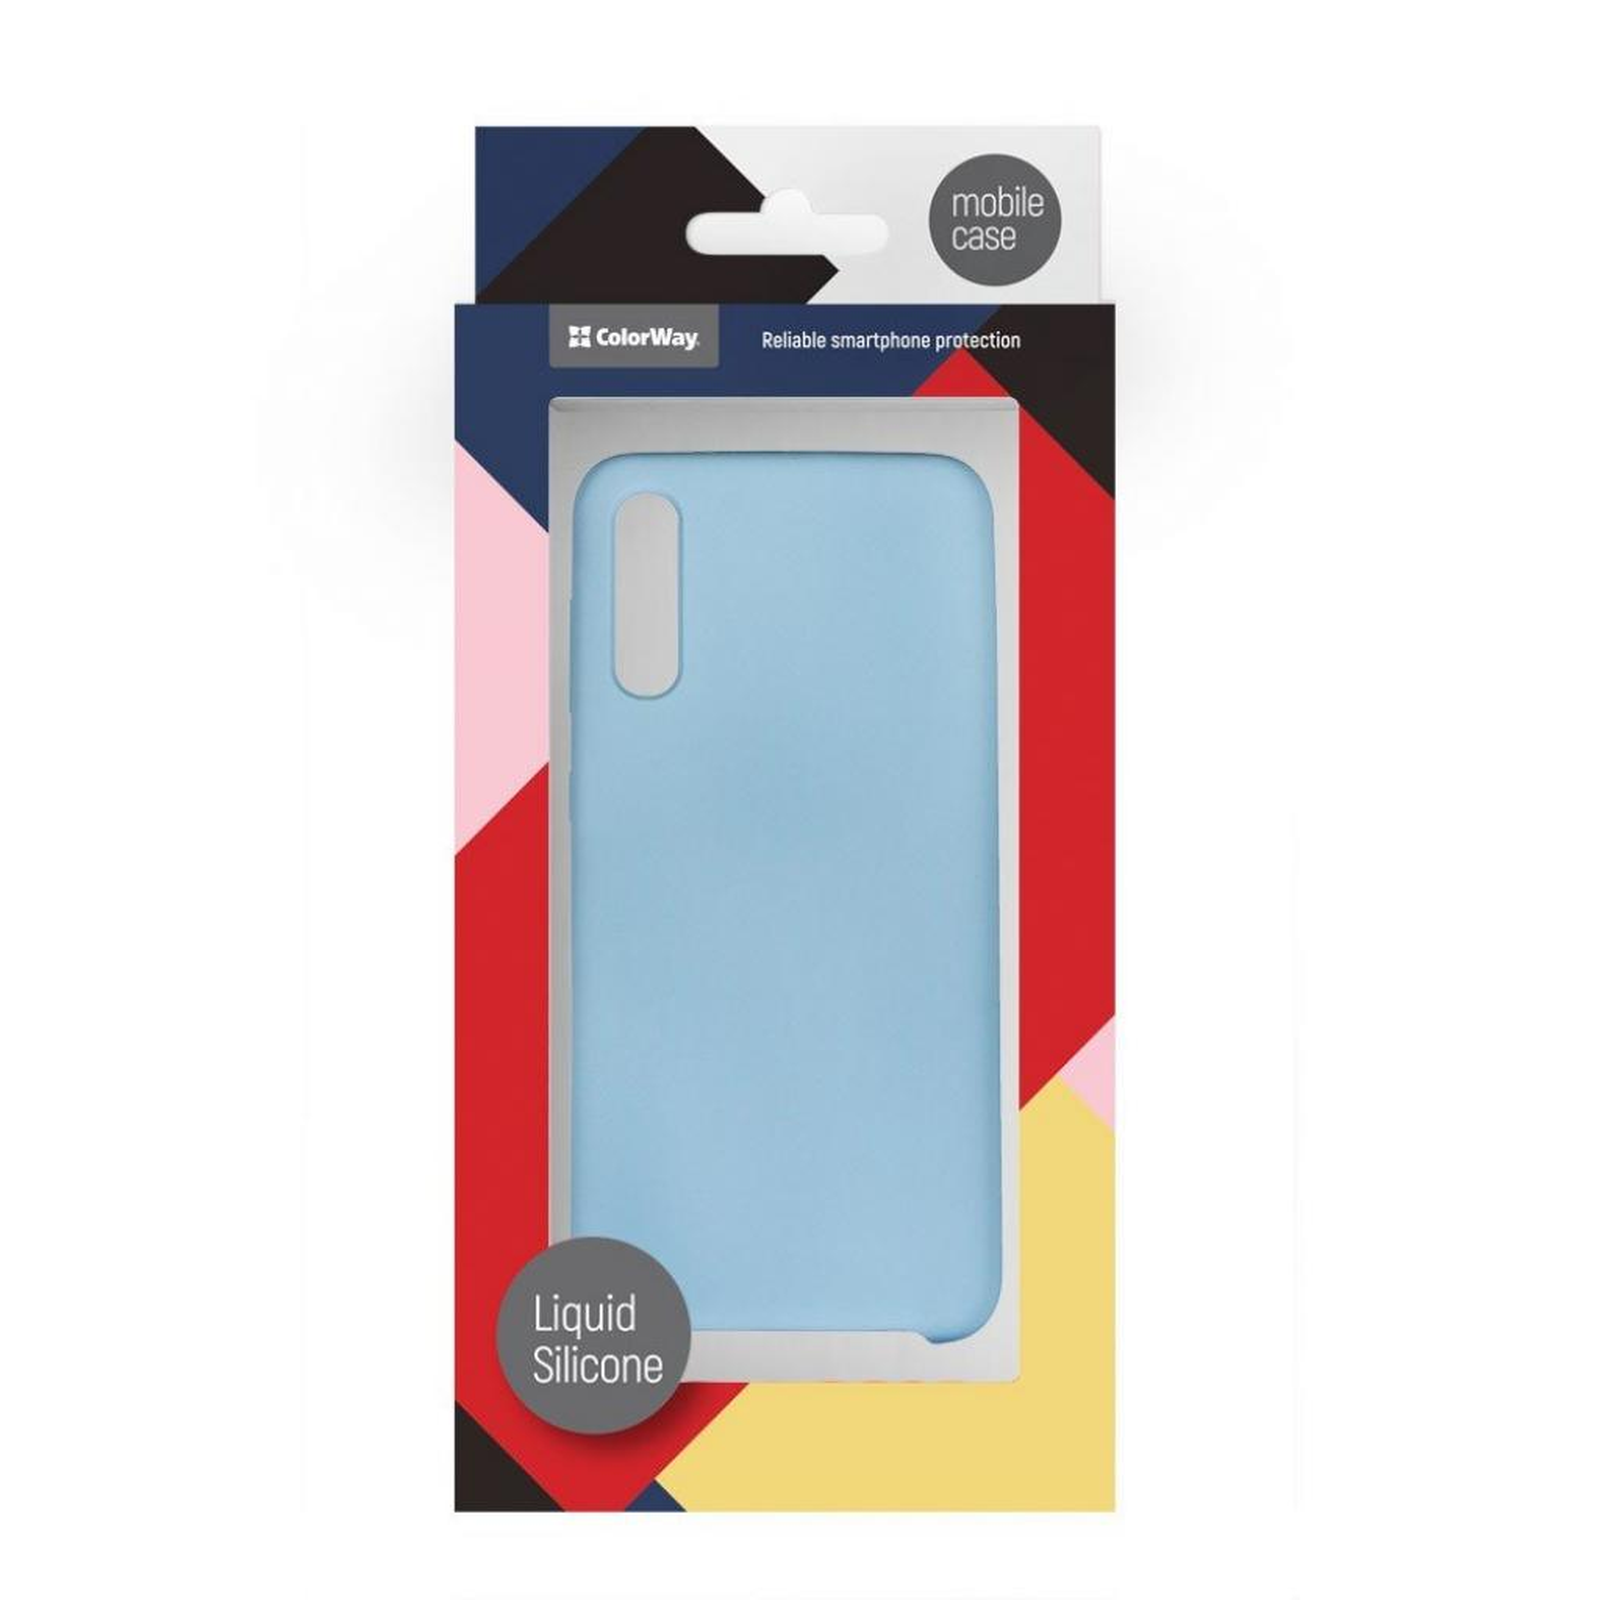 Чехол для моб. телефона ColorWay ColorWay Liquid Silicone для Samsung Galaxy A50 Yellow (CW-CLSSGA505-YL) изображение 5